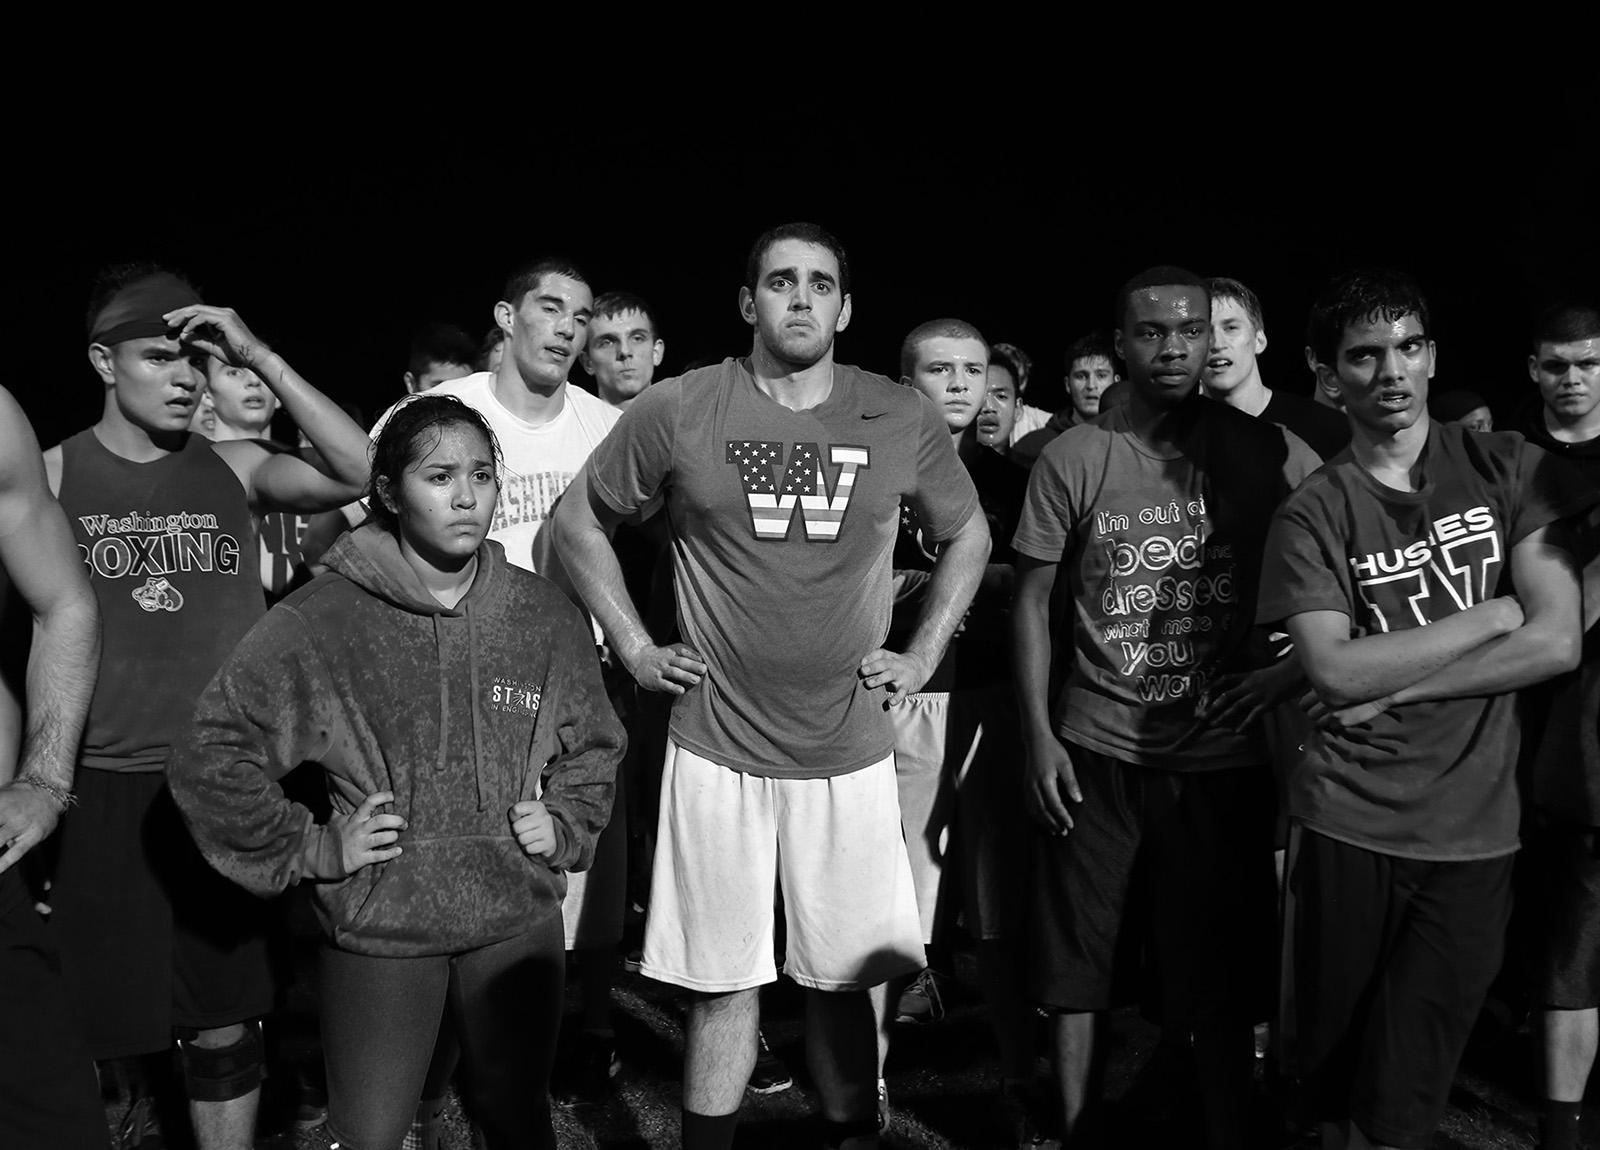 University of Washington boxing team tryouts